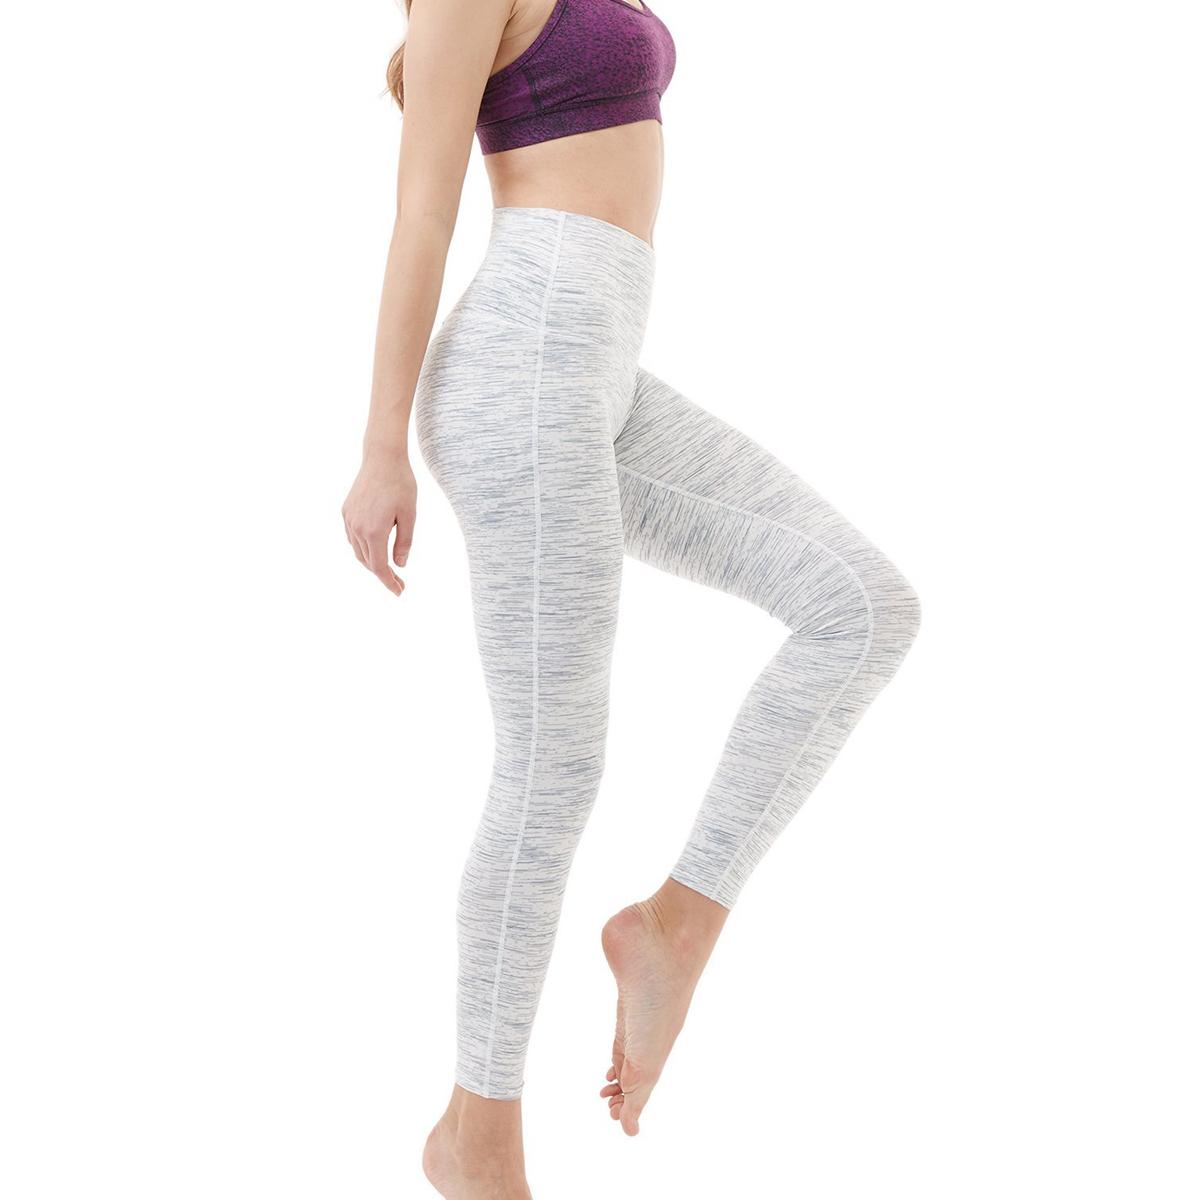 thumbnail 106 - TSLA Tesla FYP42 Women's High-Waisted Ultra-Stretch Tummy Control Yoga Pants